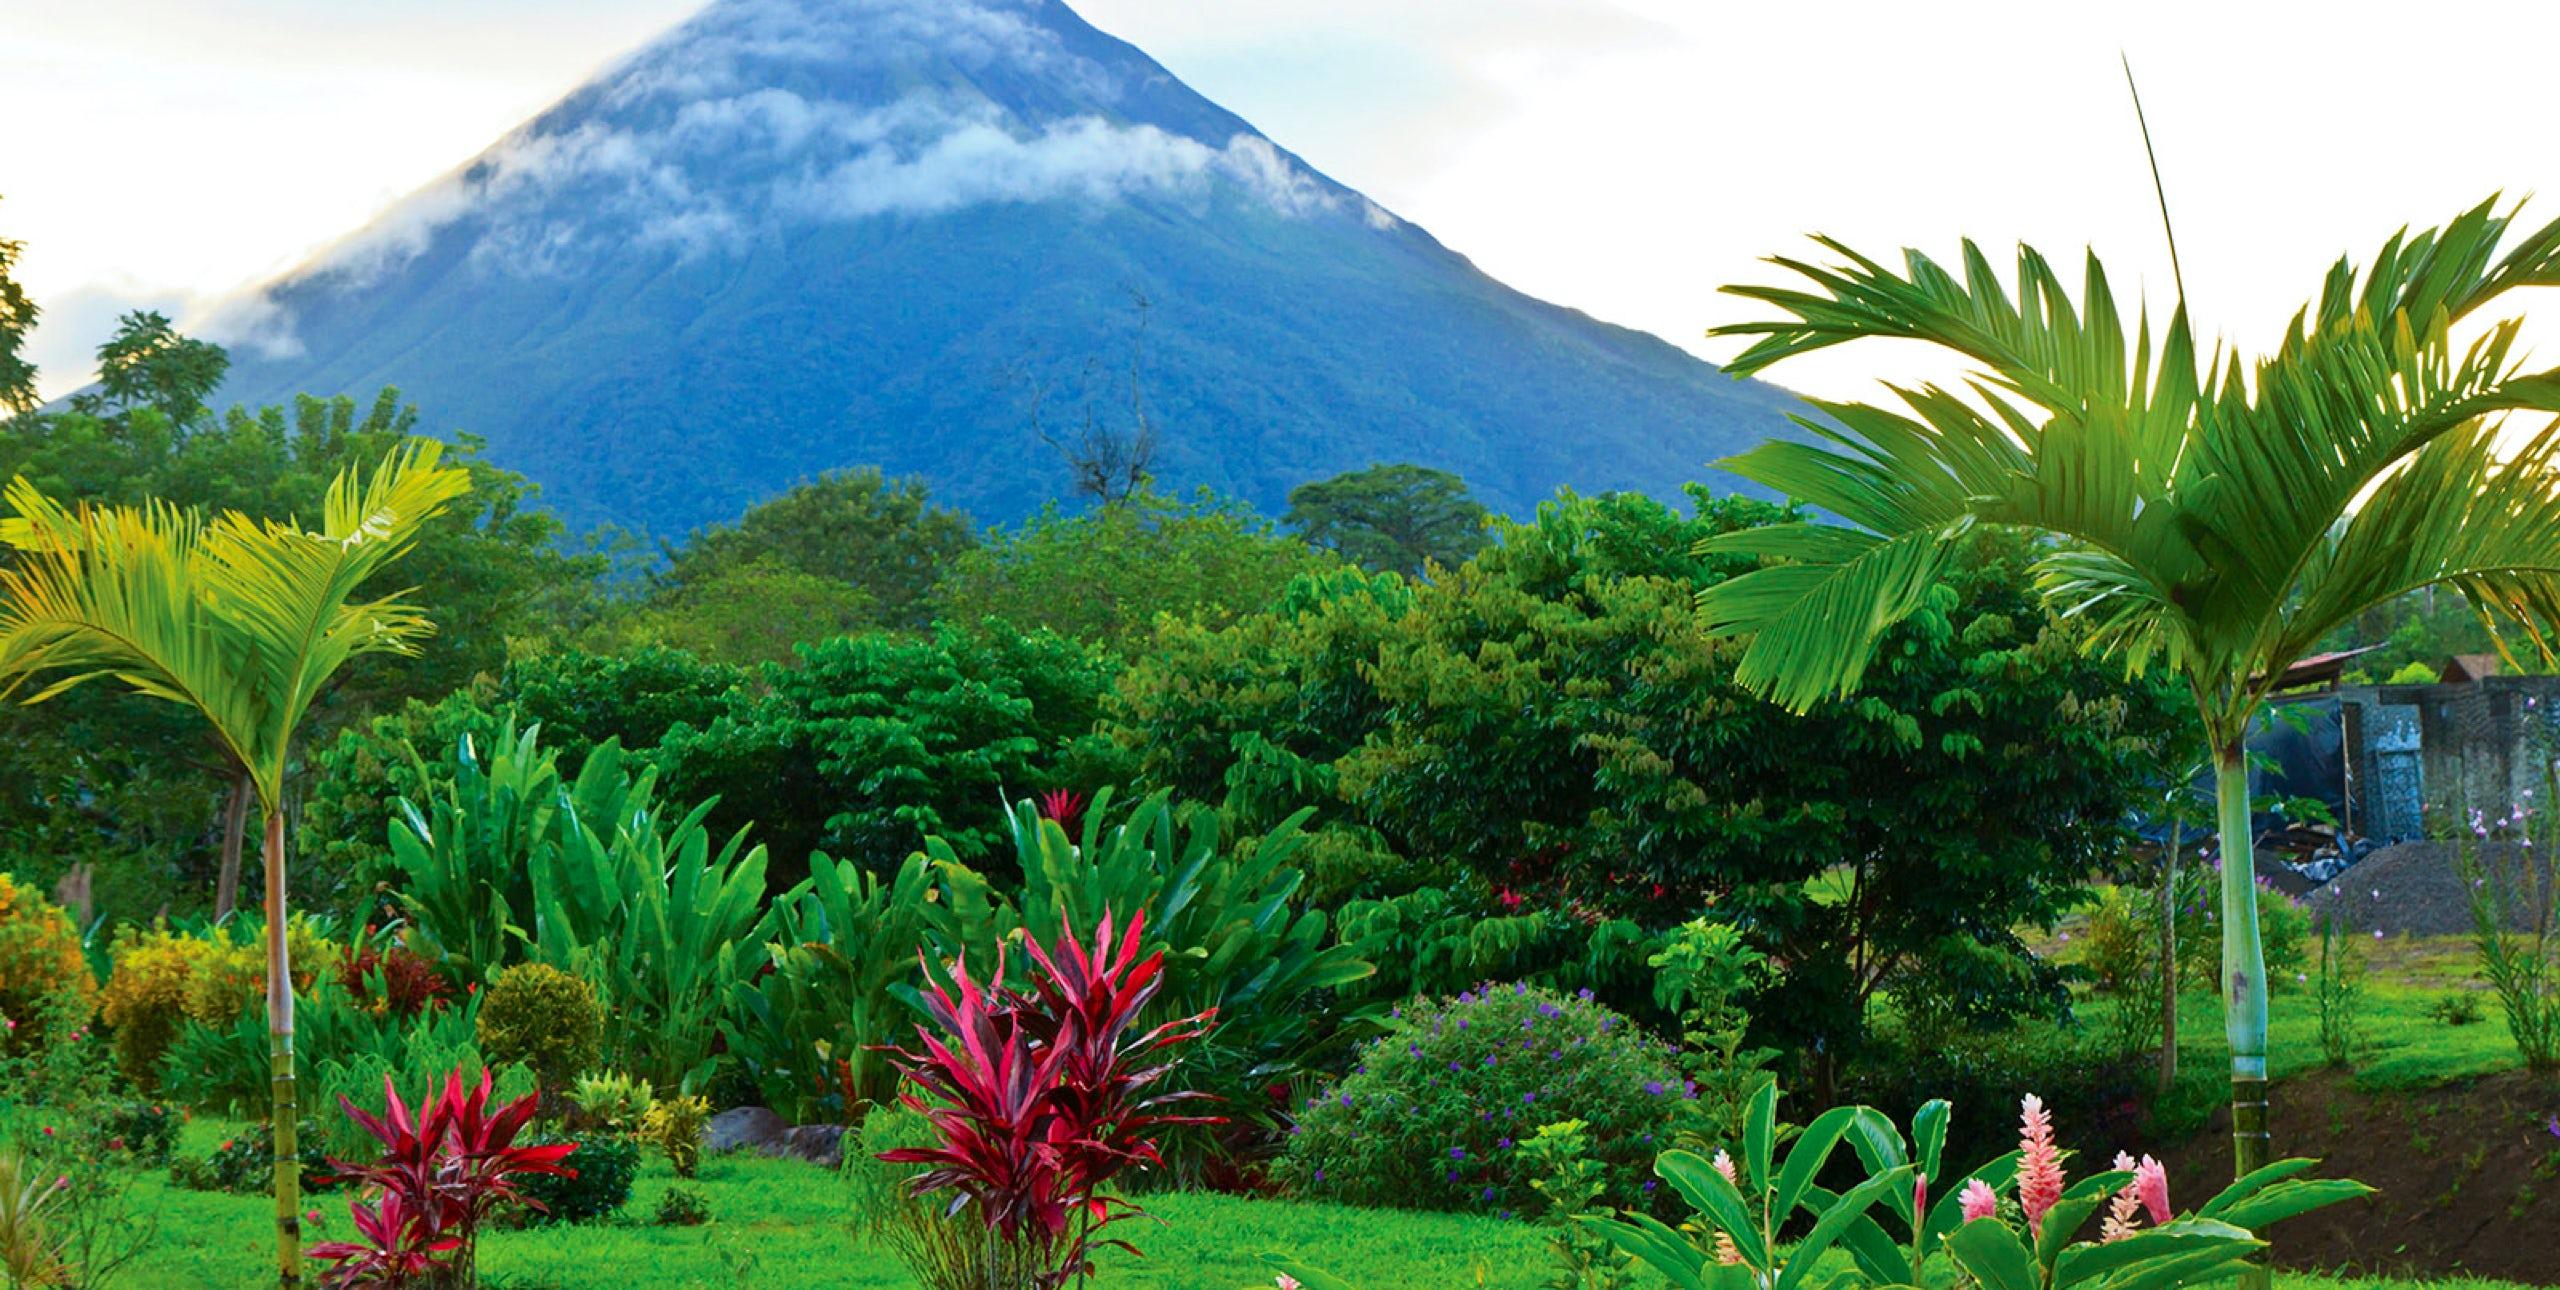 Costa Rica 2019 The Land of Wonder